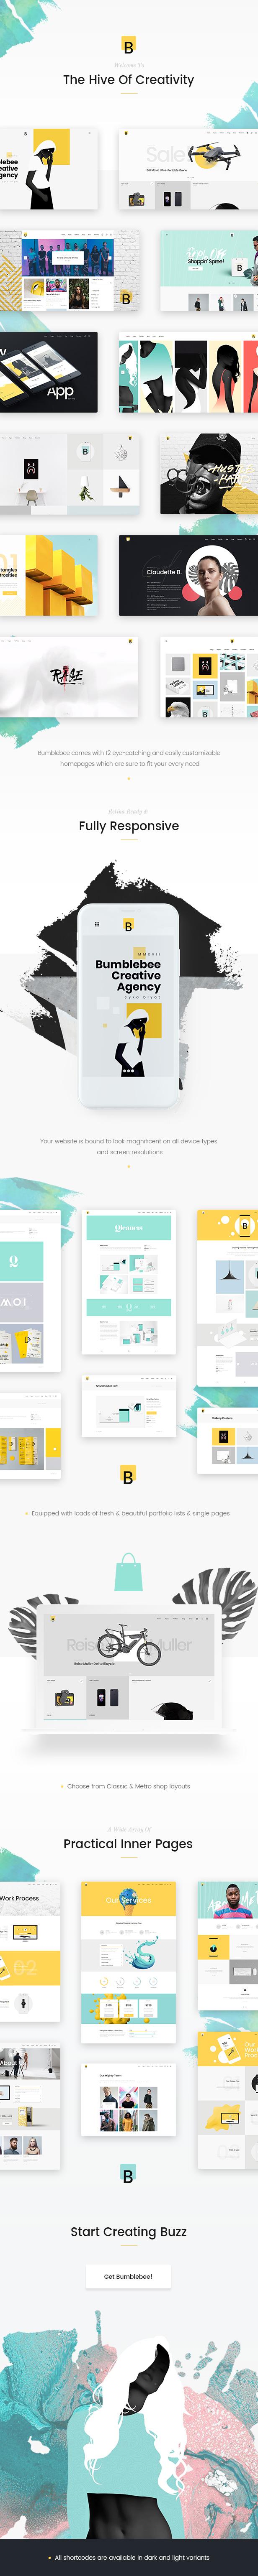 Bumblebee - Web Design Agency Theme - 1